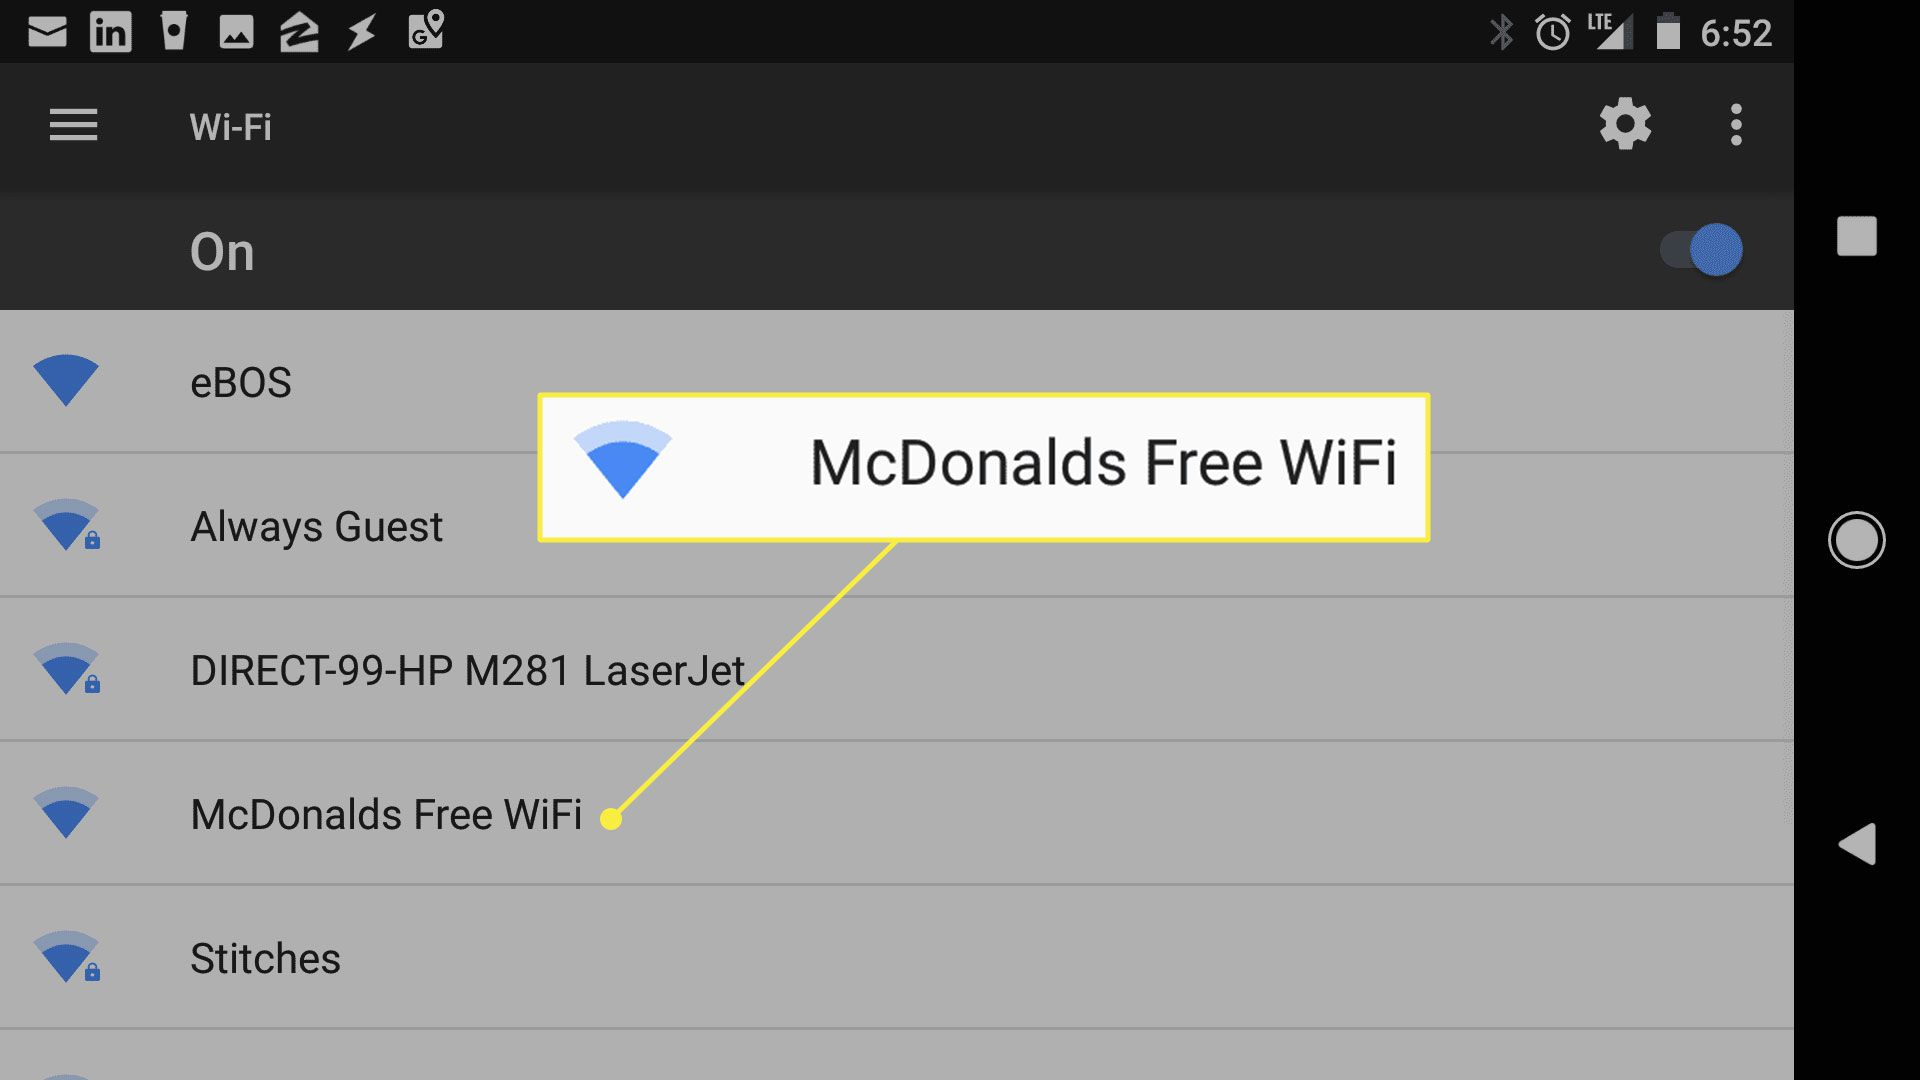 The McDonalds Free WiFi network